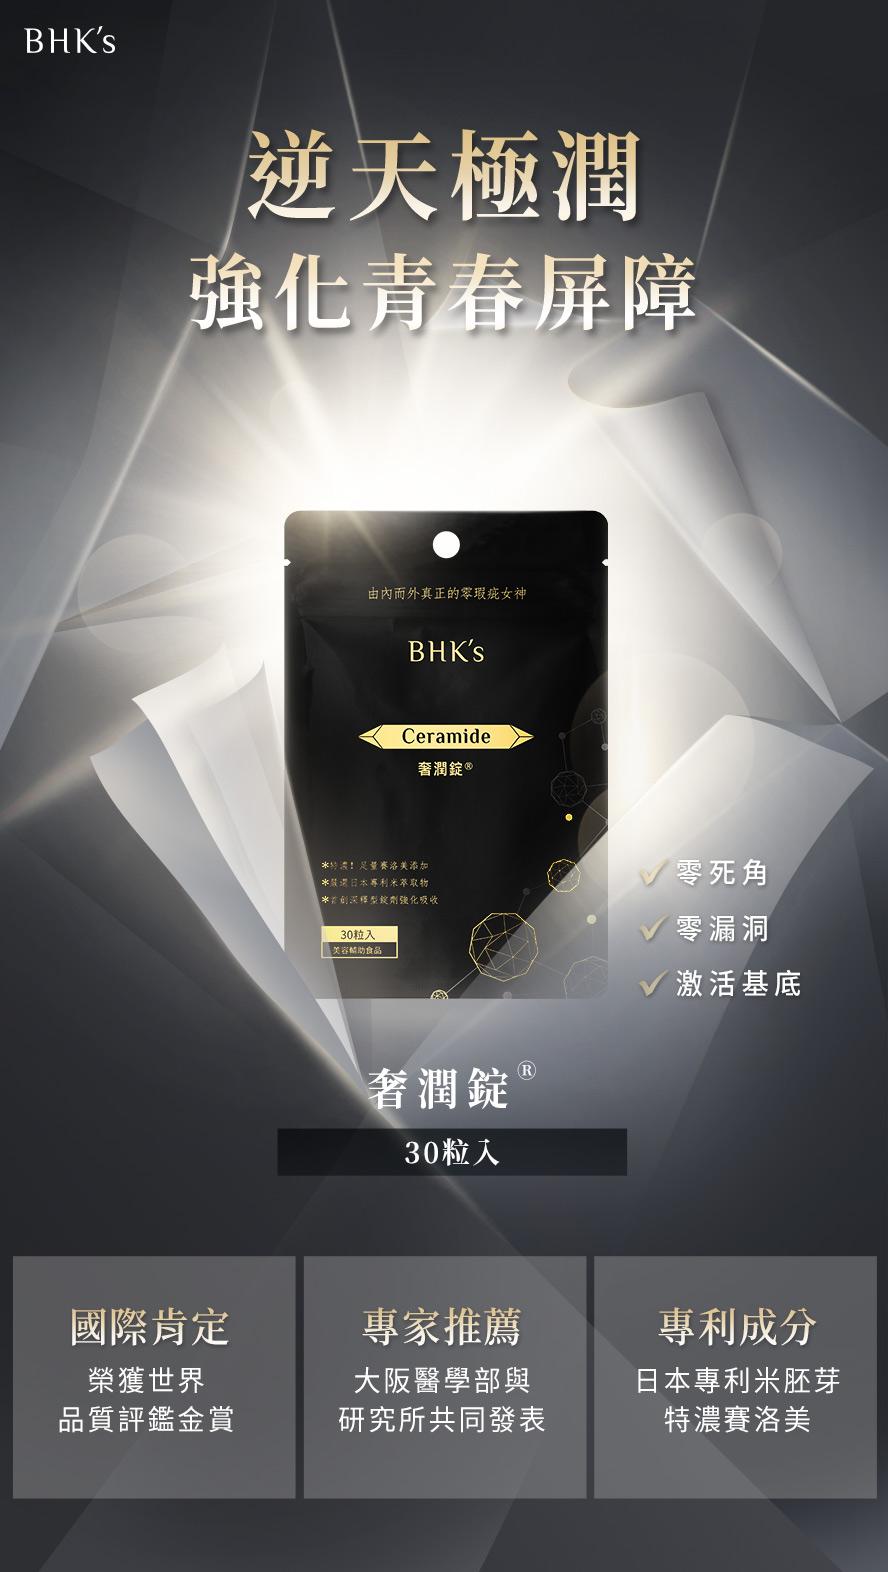 BHK's奢潤錠(賽洛美),選自風靡日本的抗皺因子神經醯胺,獲大阪醫學部研究發表,有效改善肌膚的水分含量,舒緩乾燥不適、減緩細紋增生。